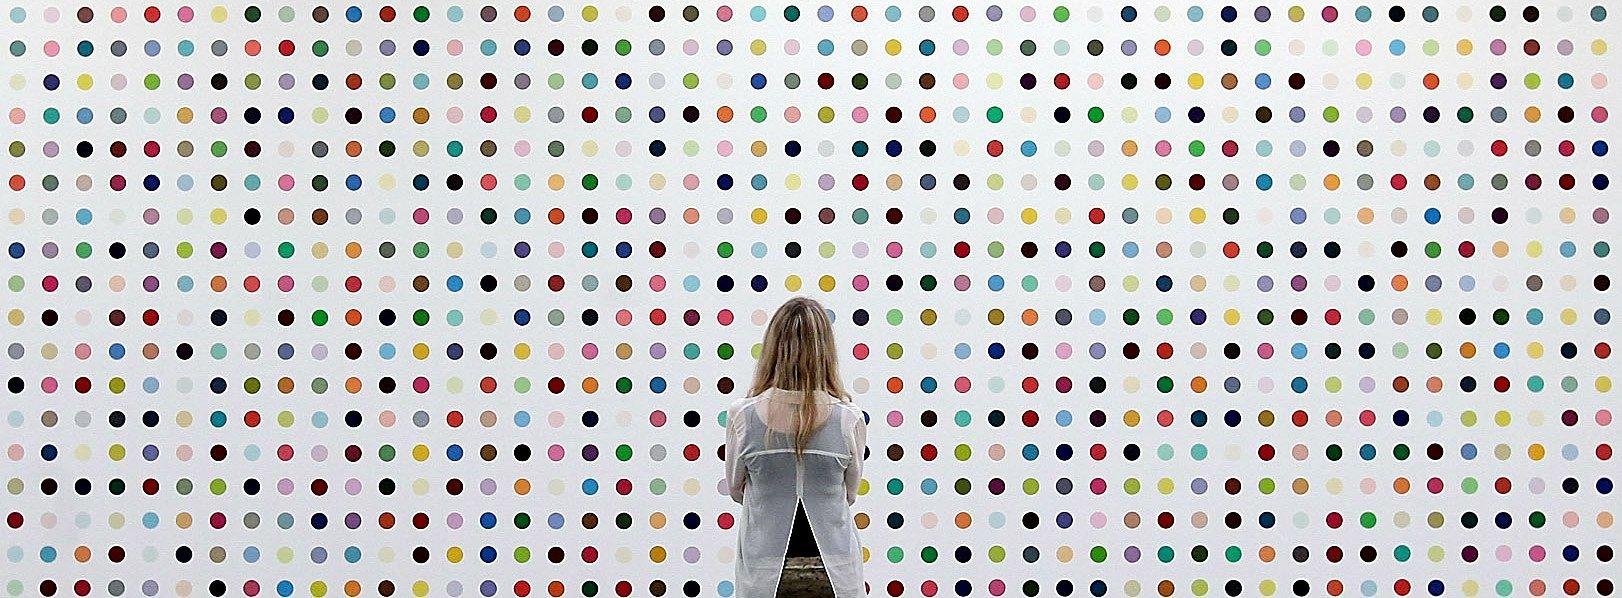 Damien Hirst - Dots